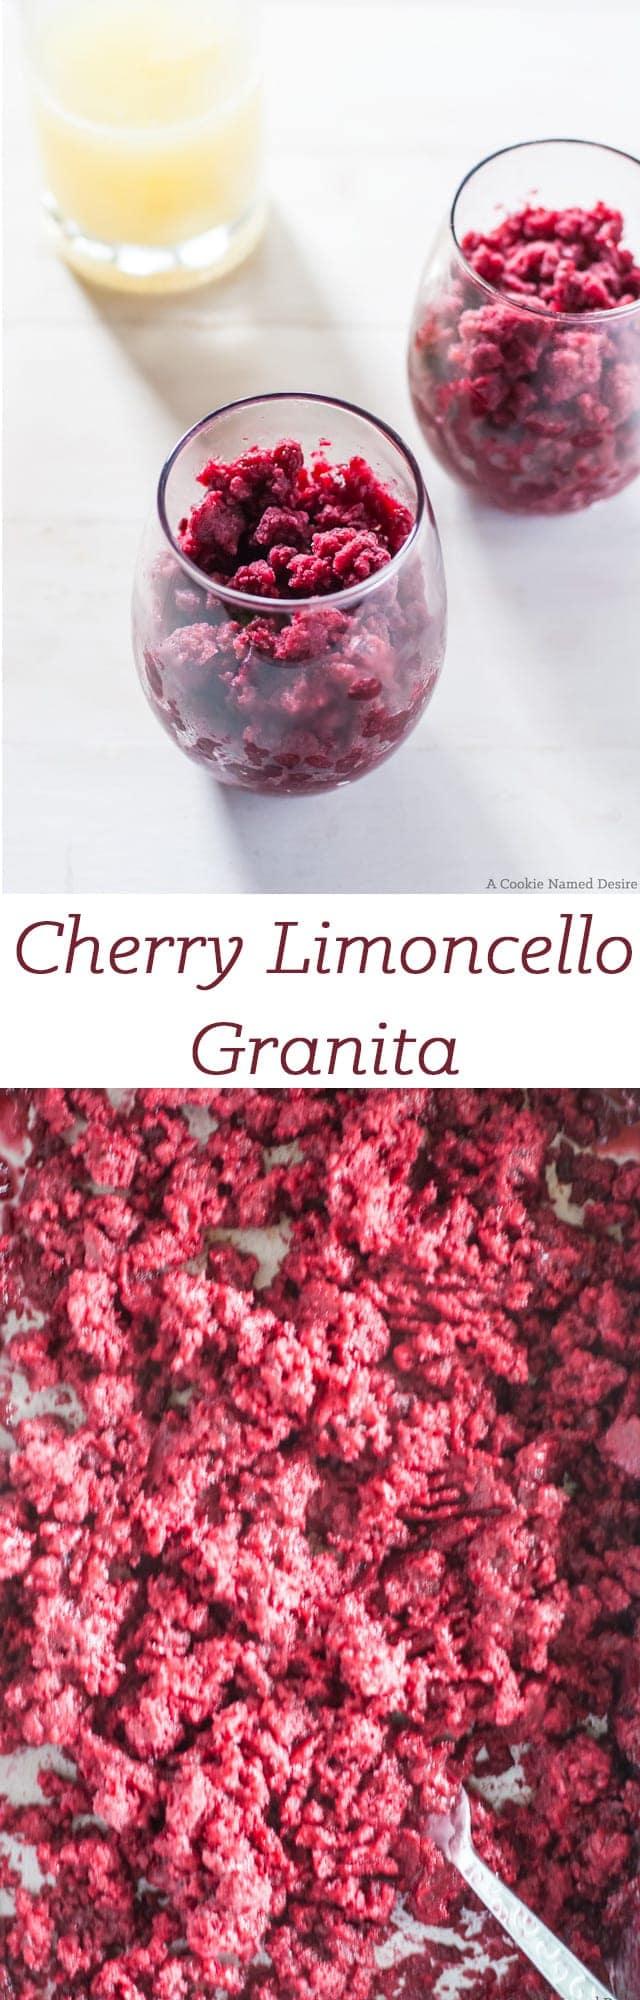 cherry limoncello granita